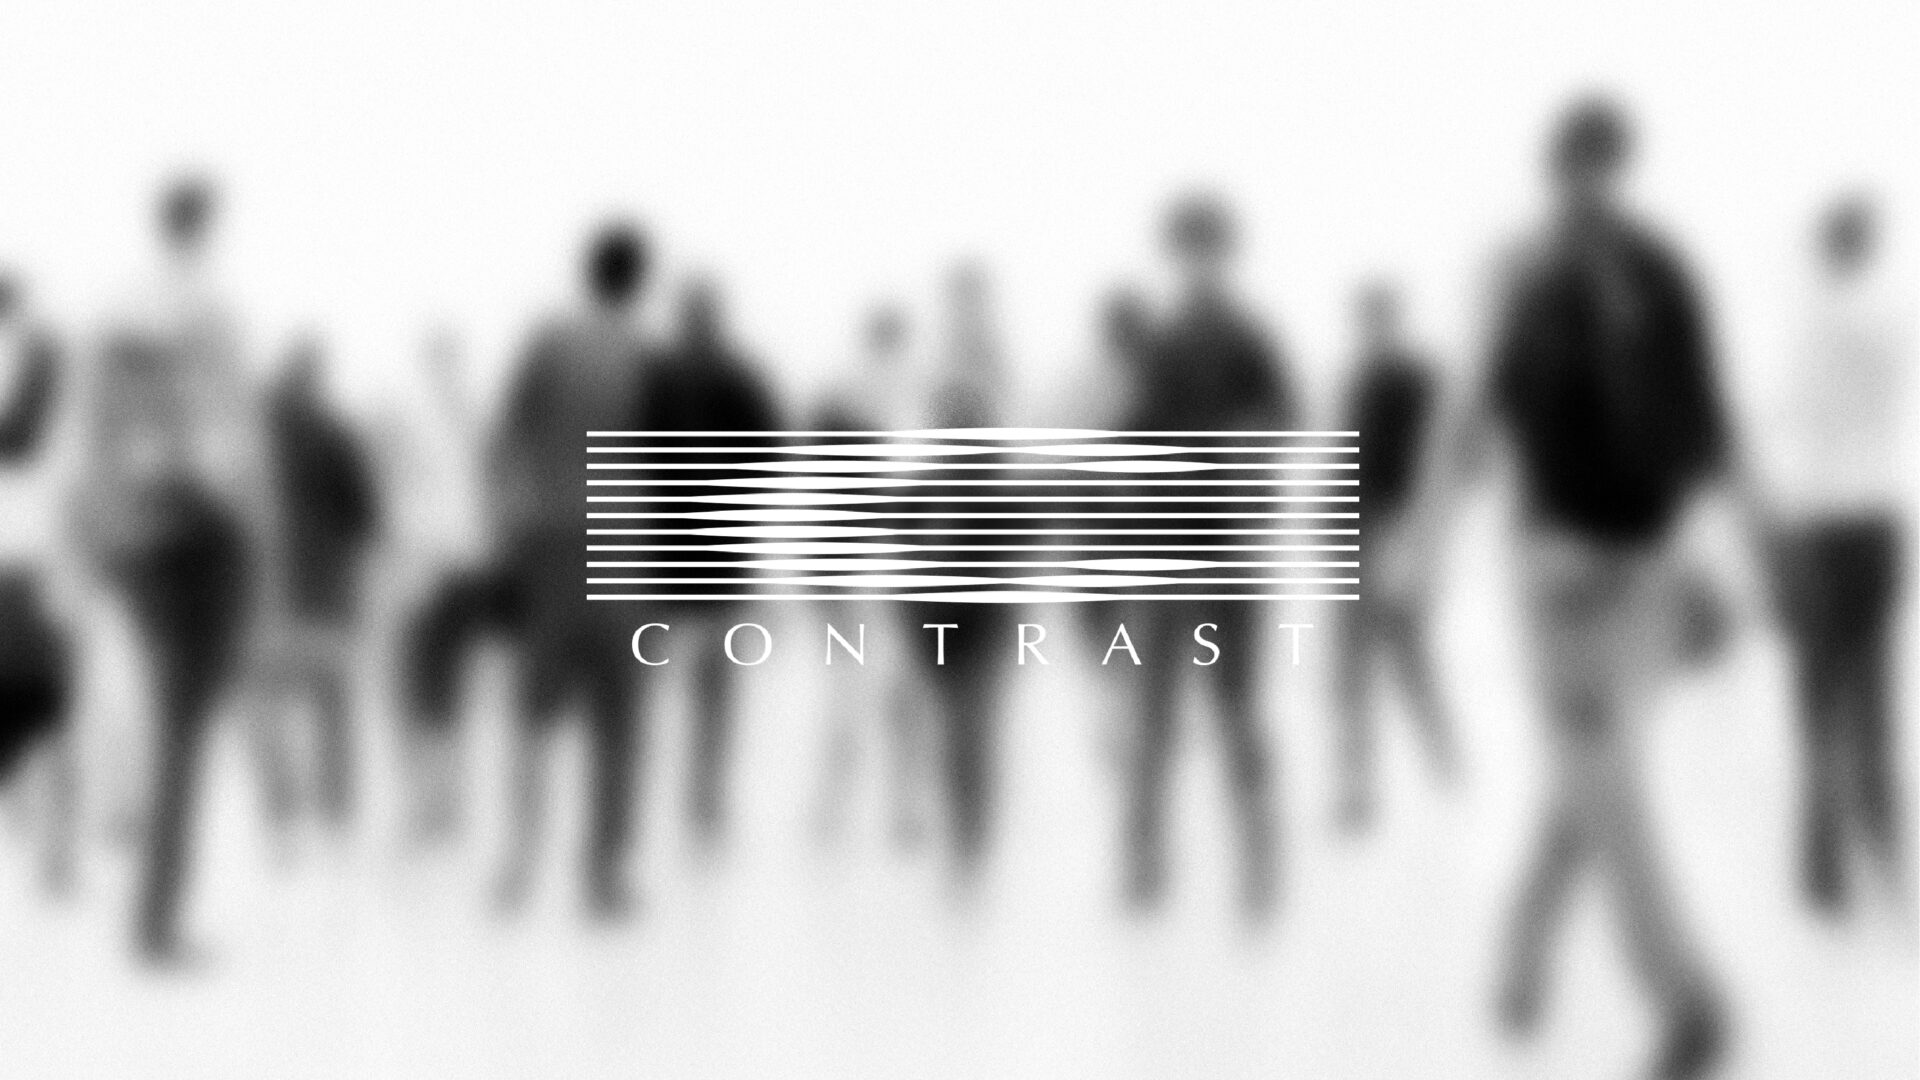 「CONTRAST」のサムネイル画像